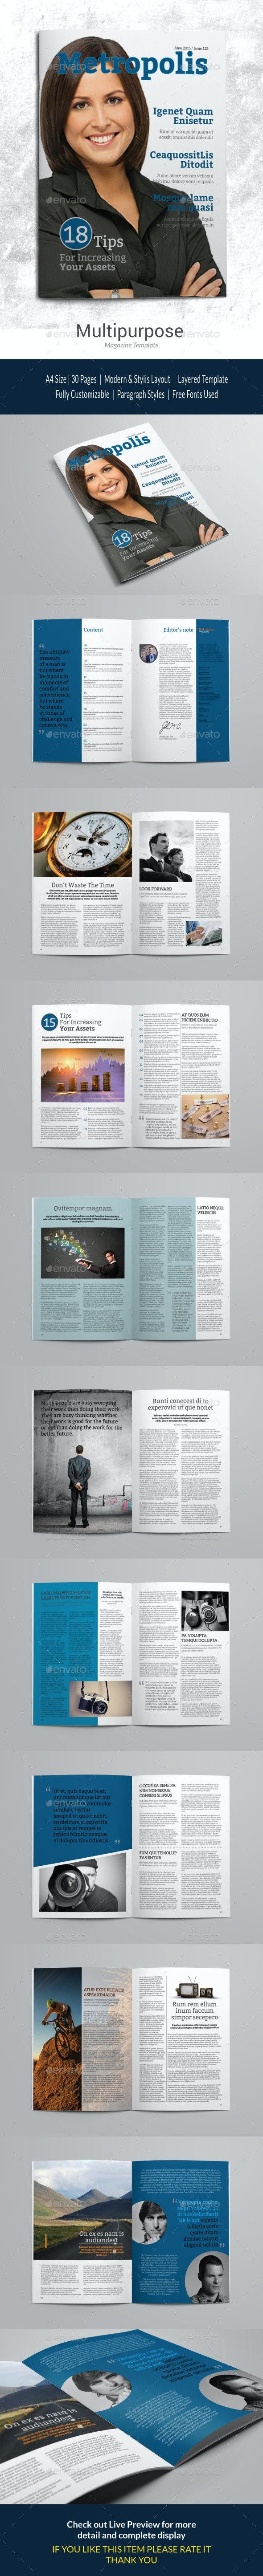 Indesign Magazine Template vol 1 - Magazines Print Templates